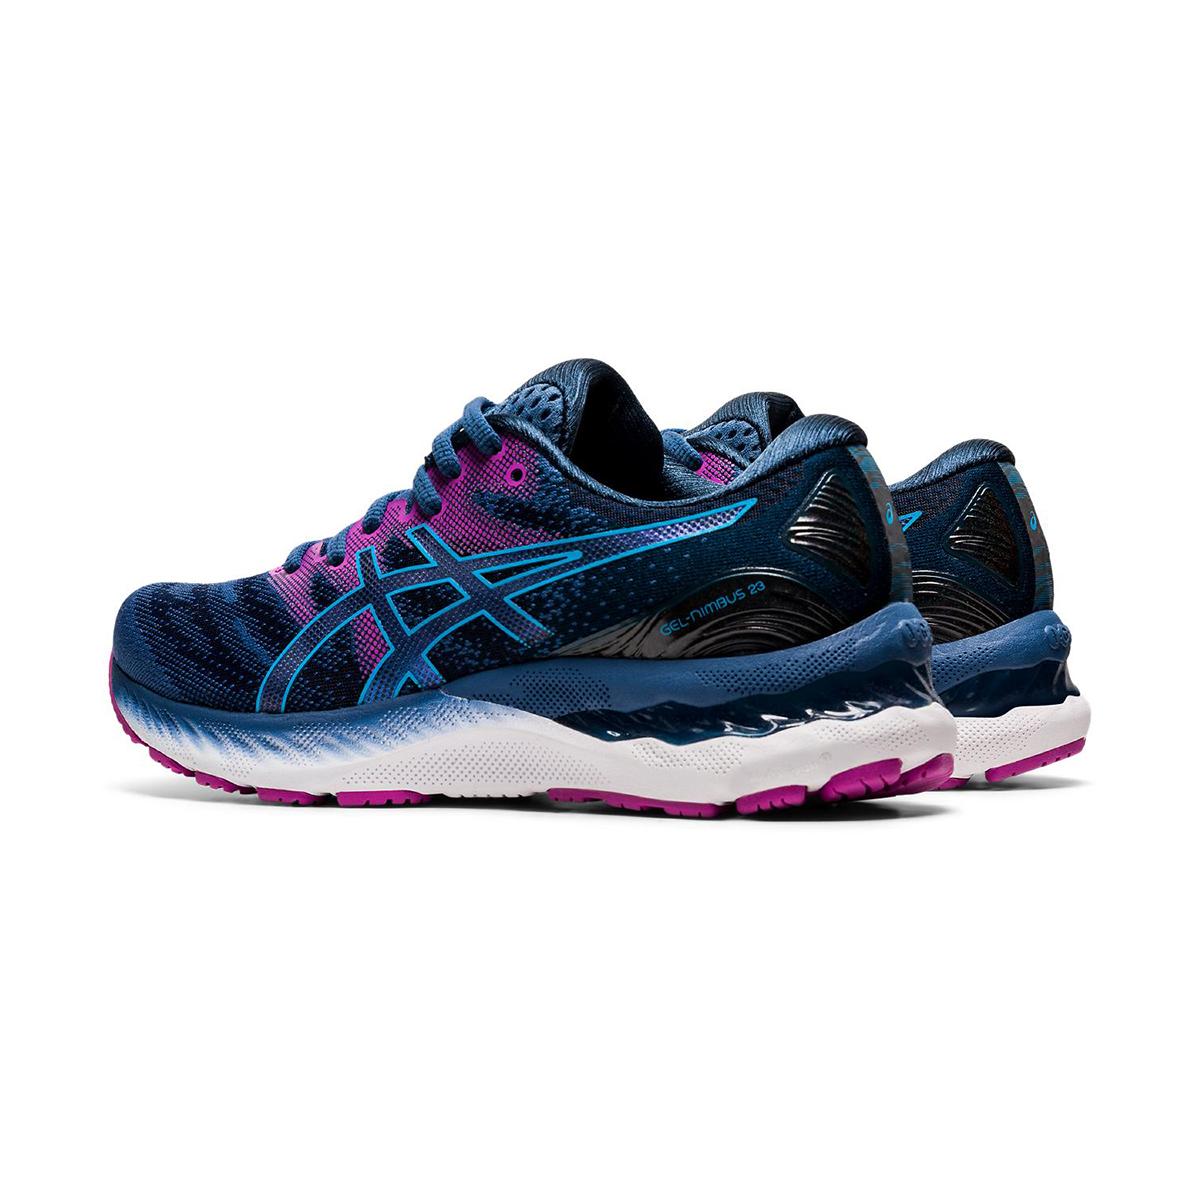 Women's Asics GEL-Nimbus 23 Running Shoe - Color: Grand Shark/Digital Aqua - Size: 5 - Width: Regular, Grand Shark/Digital Aqua, large, image 2